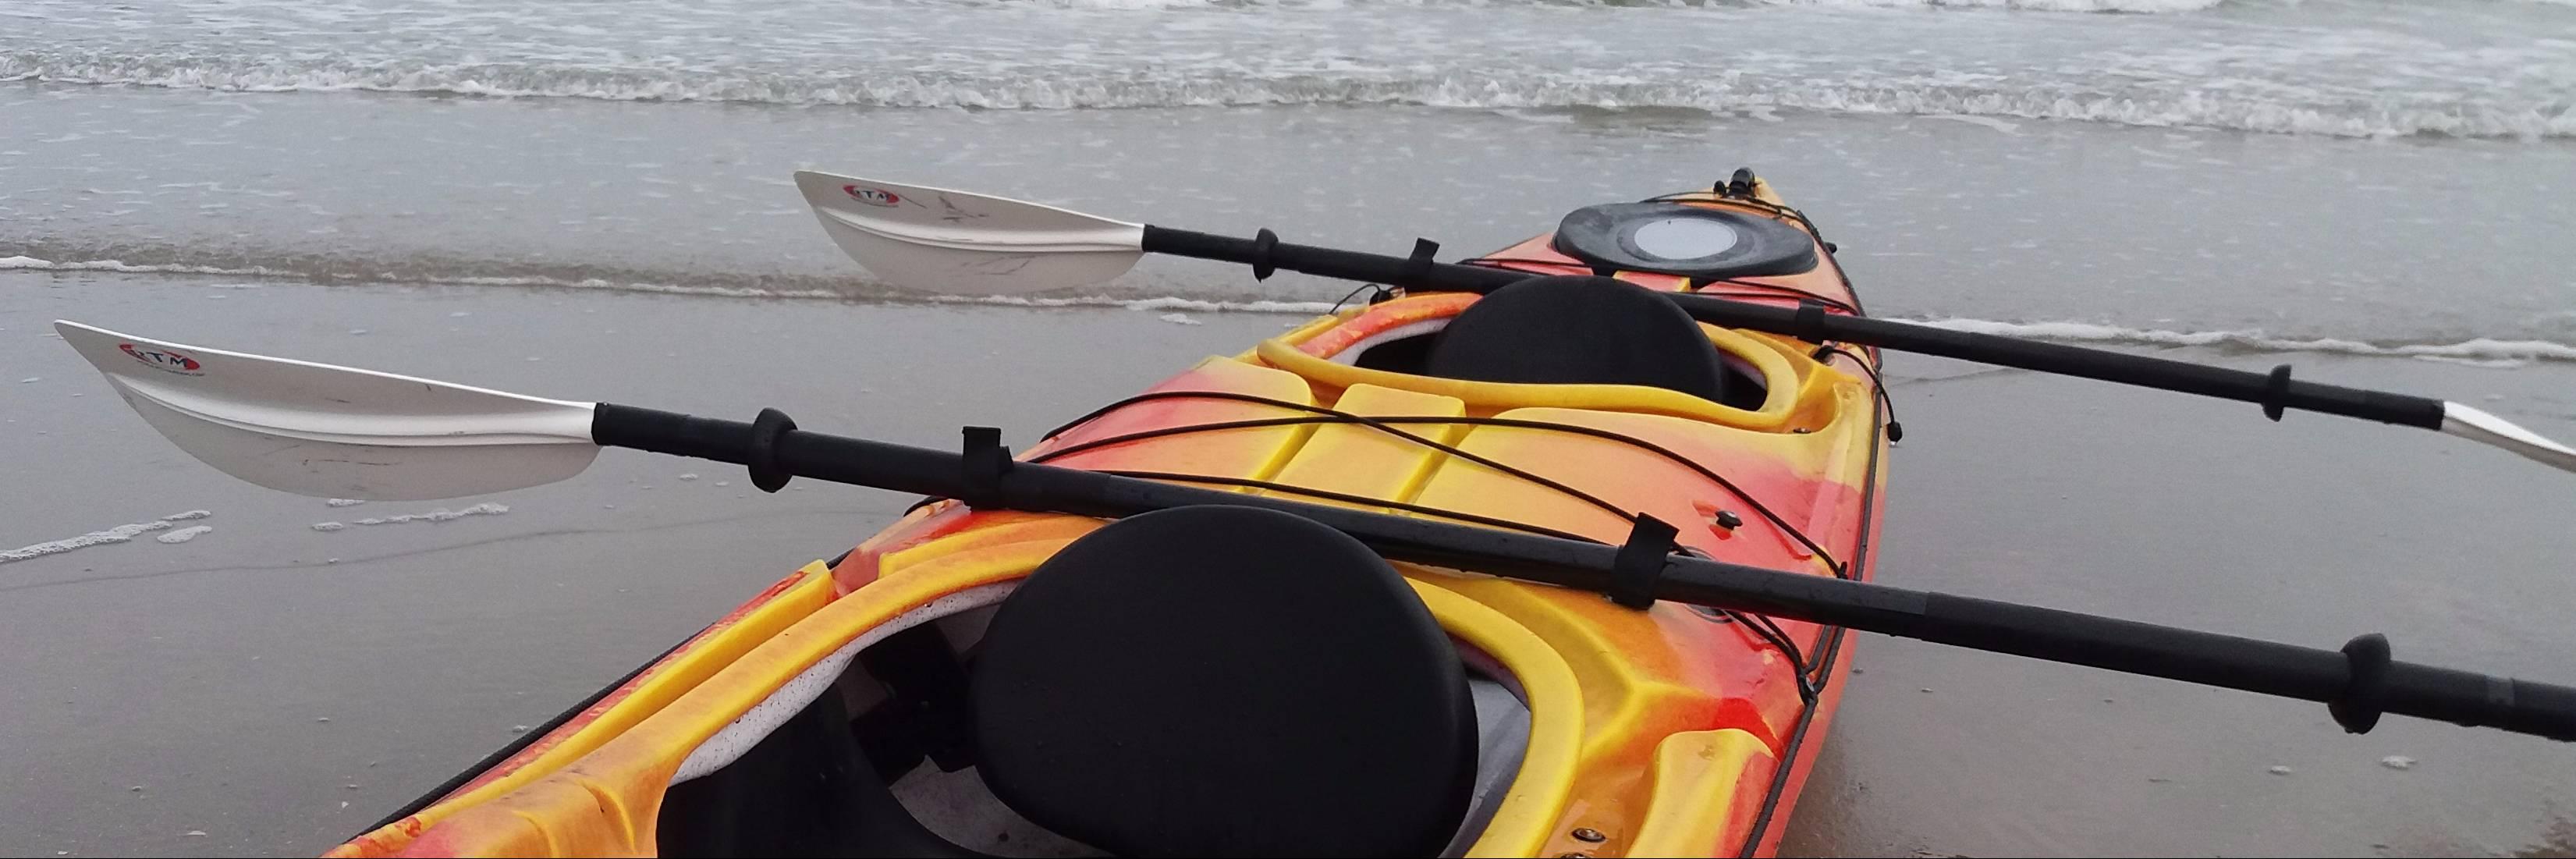 risingtrack travers e de la manche en kayak crossing the channel kayak. Black Bedroom Furniture Sets. Home Design Ideas